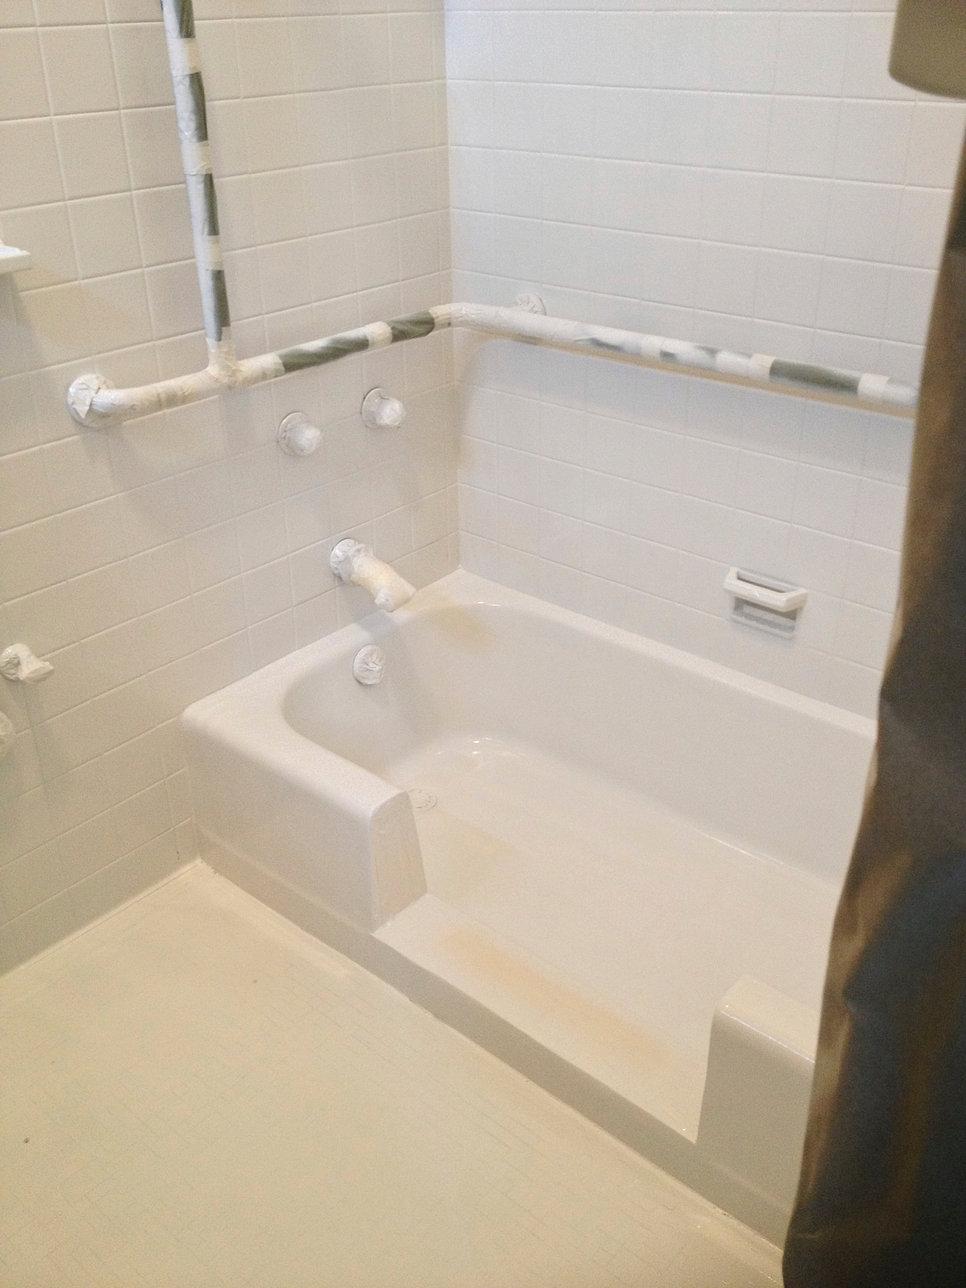 Fine Tub Paint Small Paint Bathtub Rectangular Painting Bathtub Paint Tub Old Bathtub Repair Contractor Yellow Bathtub Refinishing Company